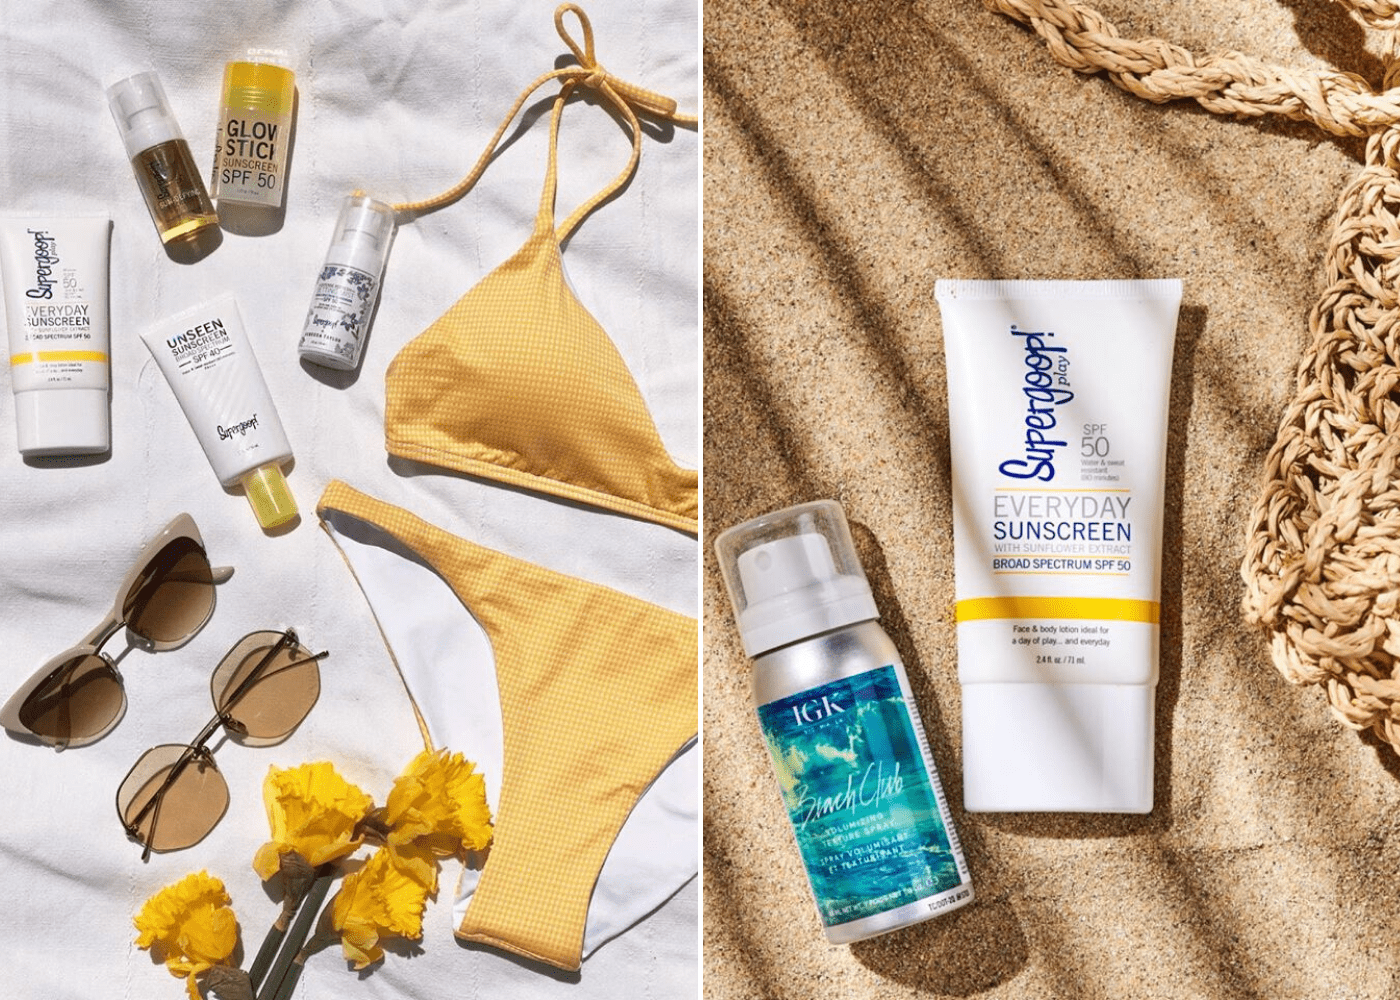 SuperGoop! Everyday Sunscreen SPF 50 | Best sunscreens for face